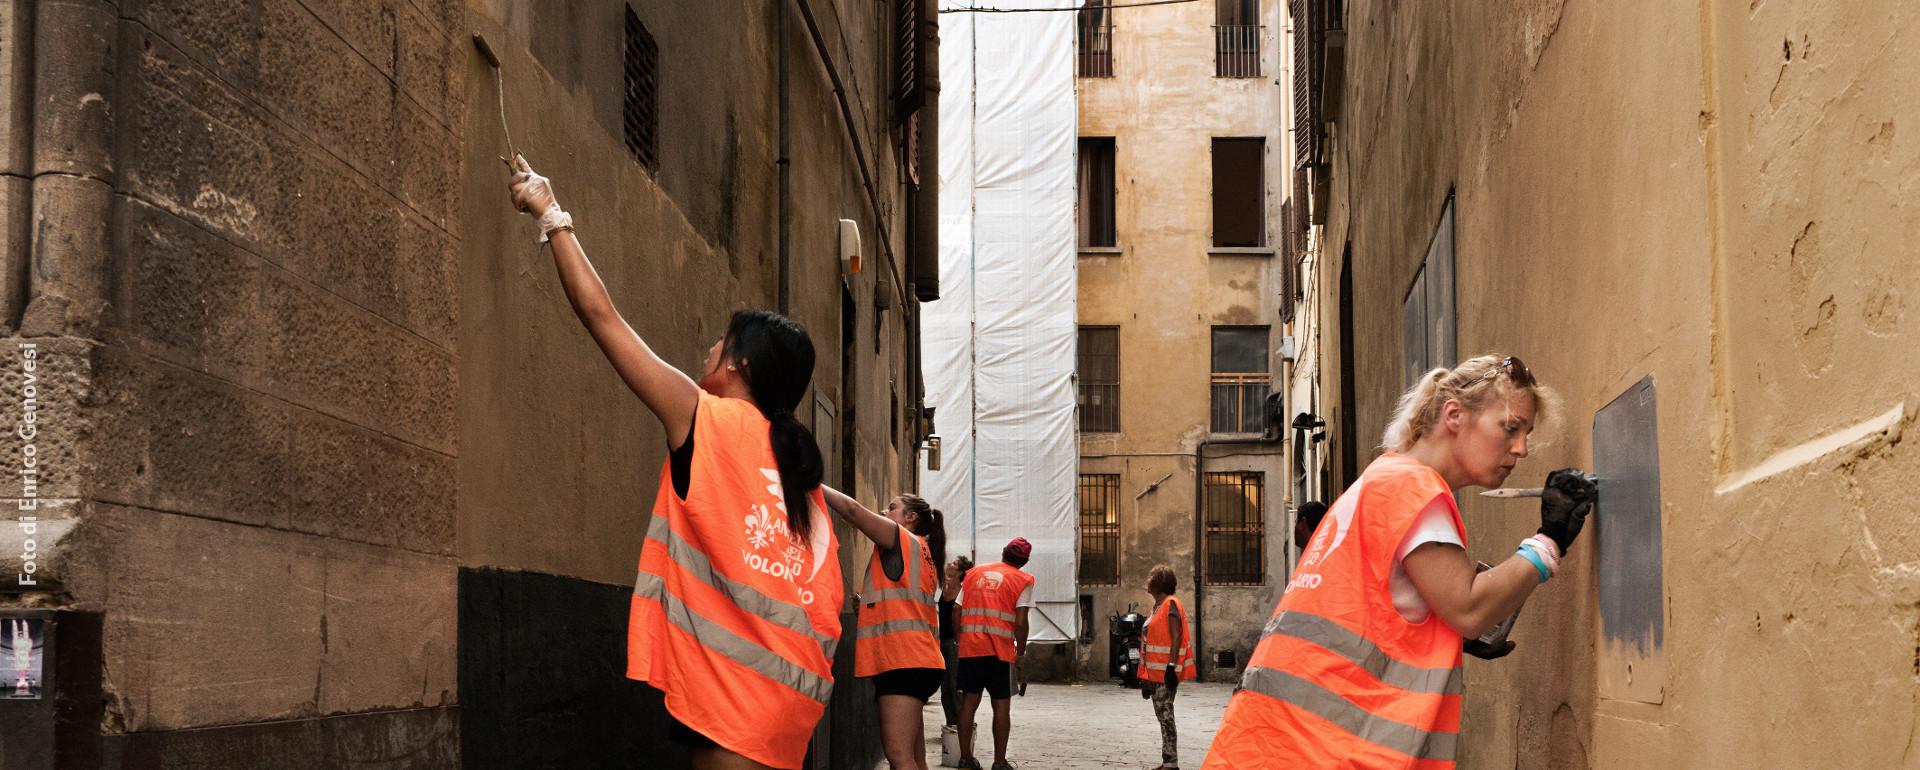 https://giovanisi.it/2018/06/28/giovani-e-beni-comuni-i-vincitori-del-bando/